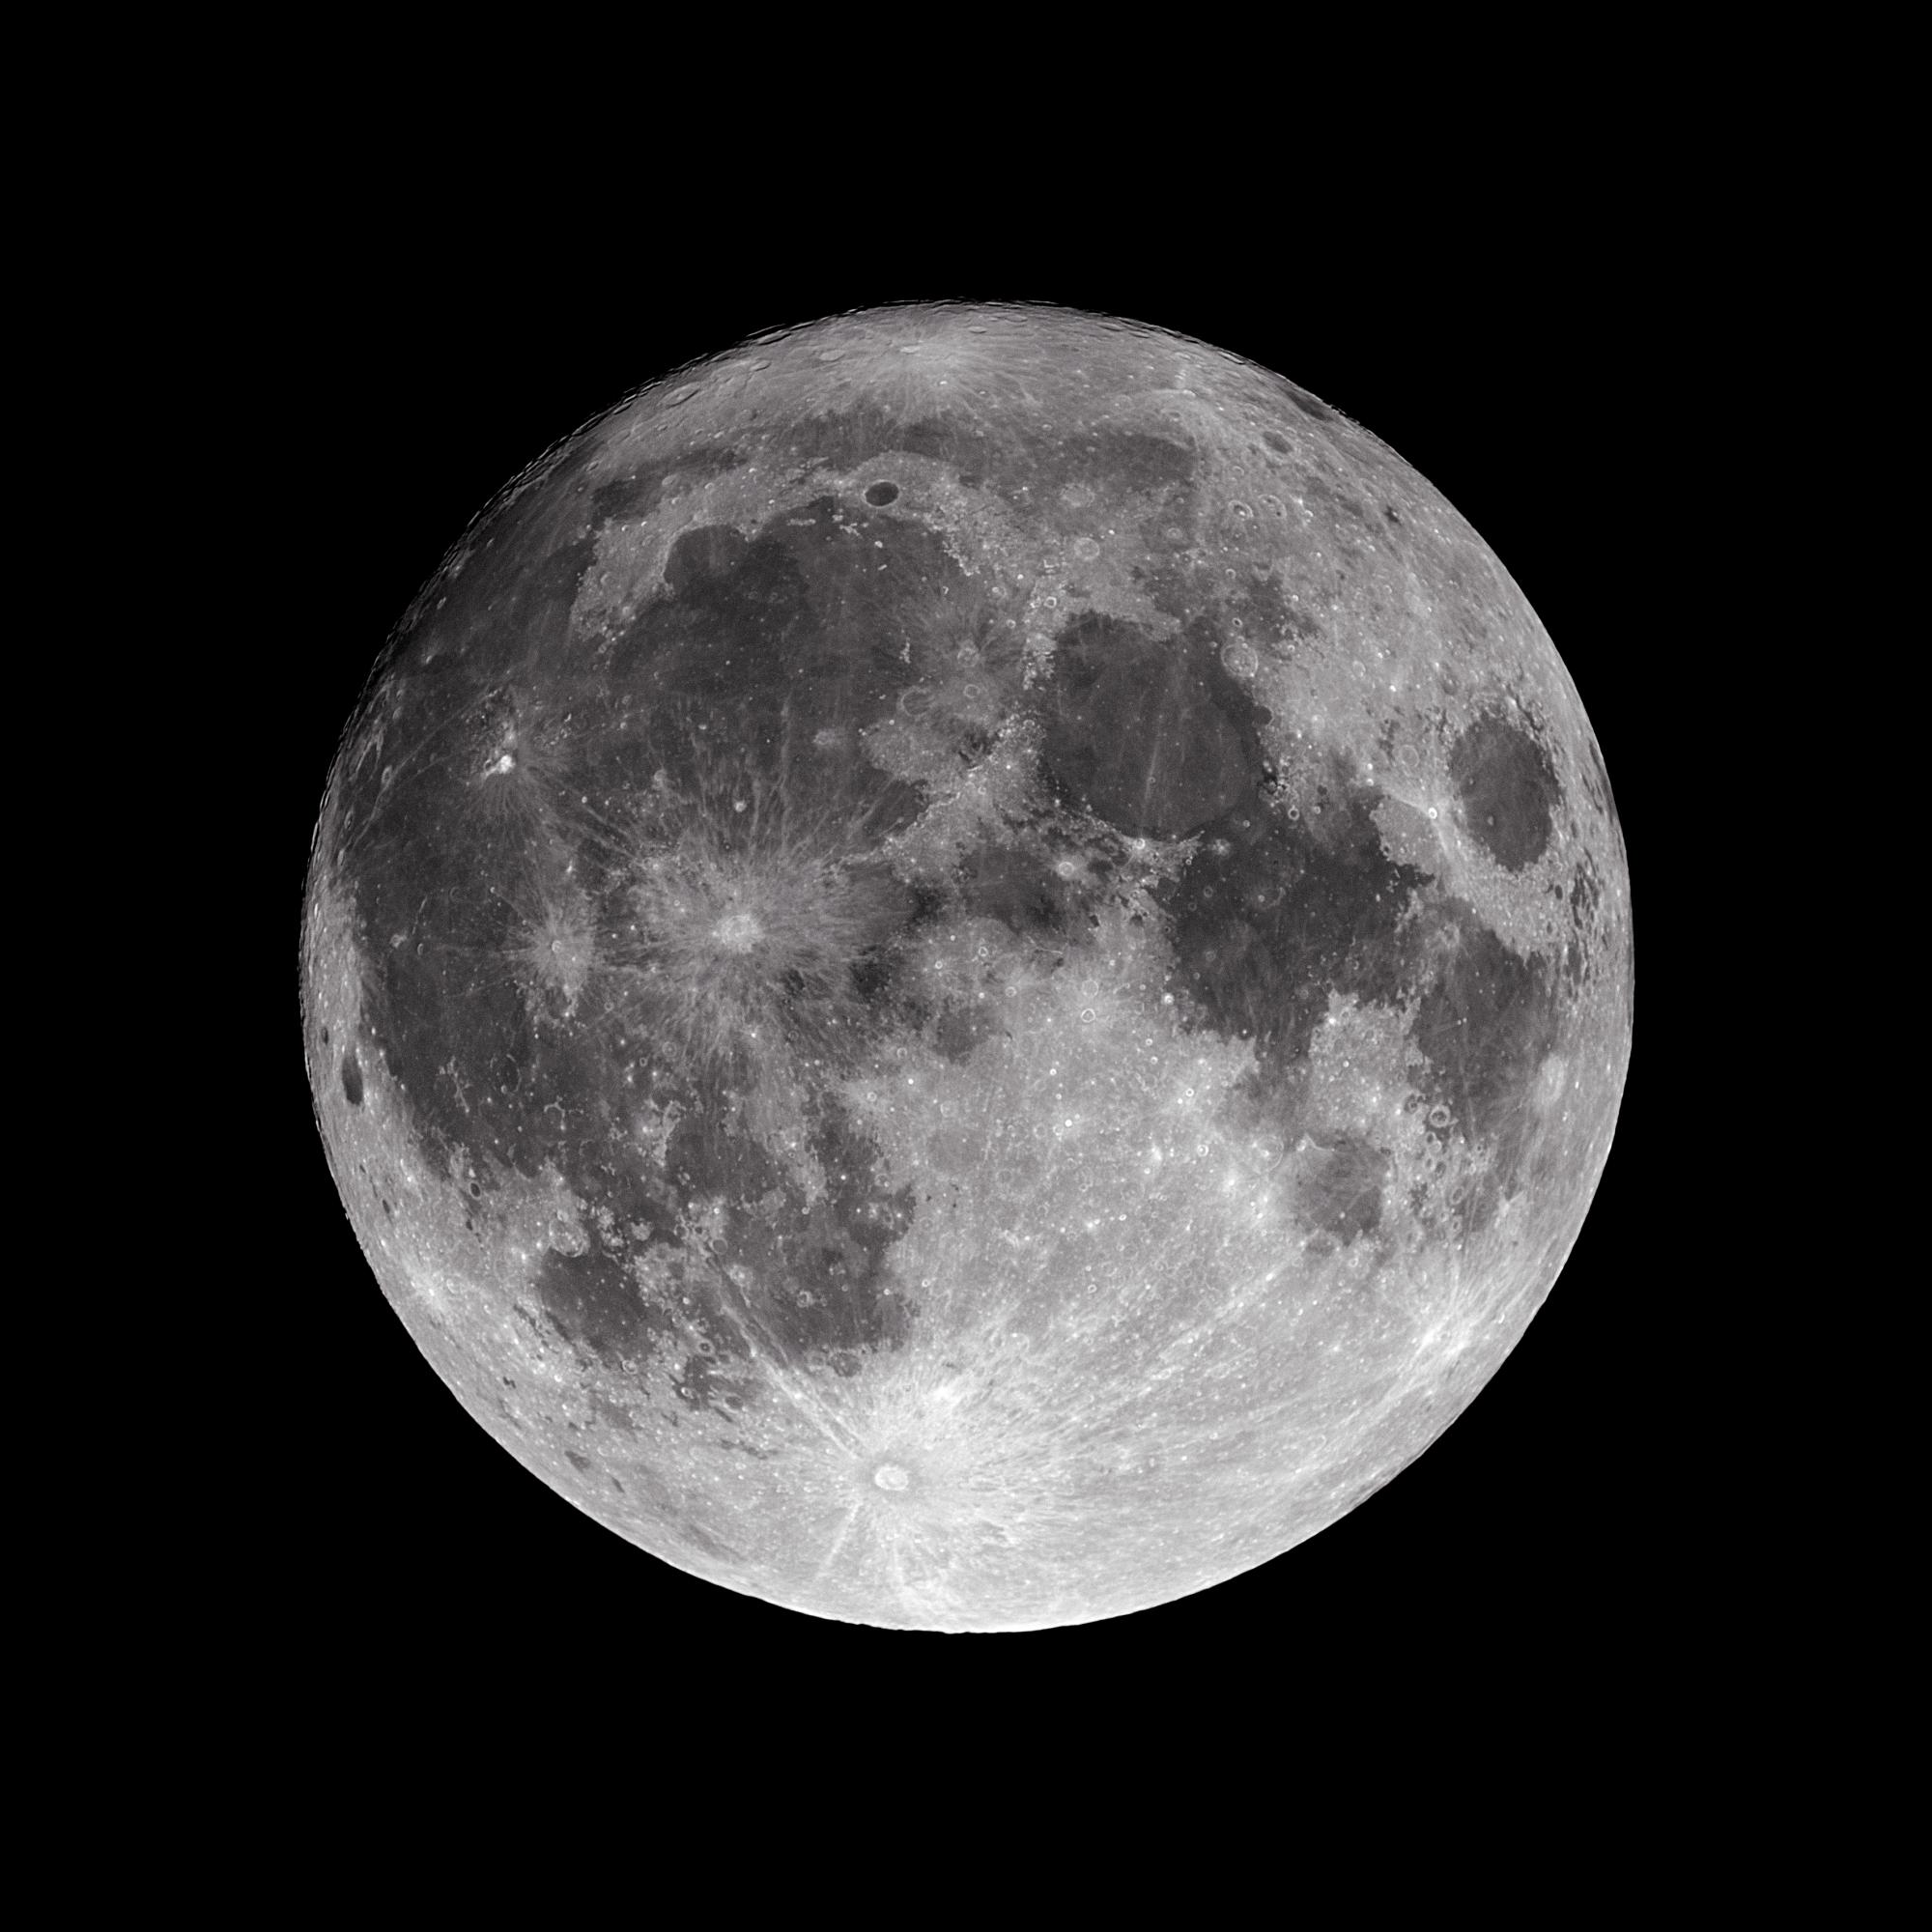 Lune130919.thumb.png.b90dbf49da39e0ca0832e1c7bf1bb1a2.png